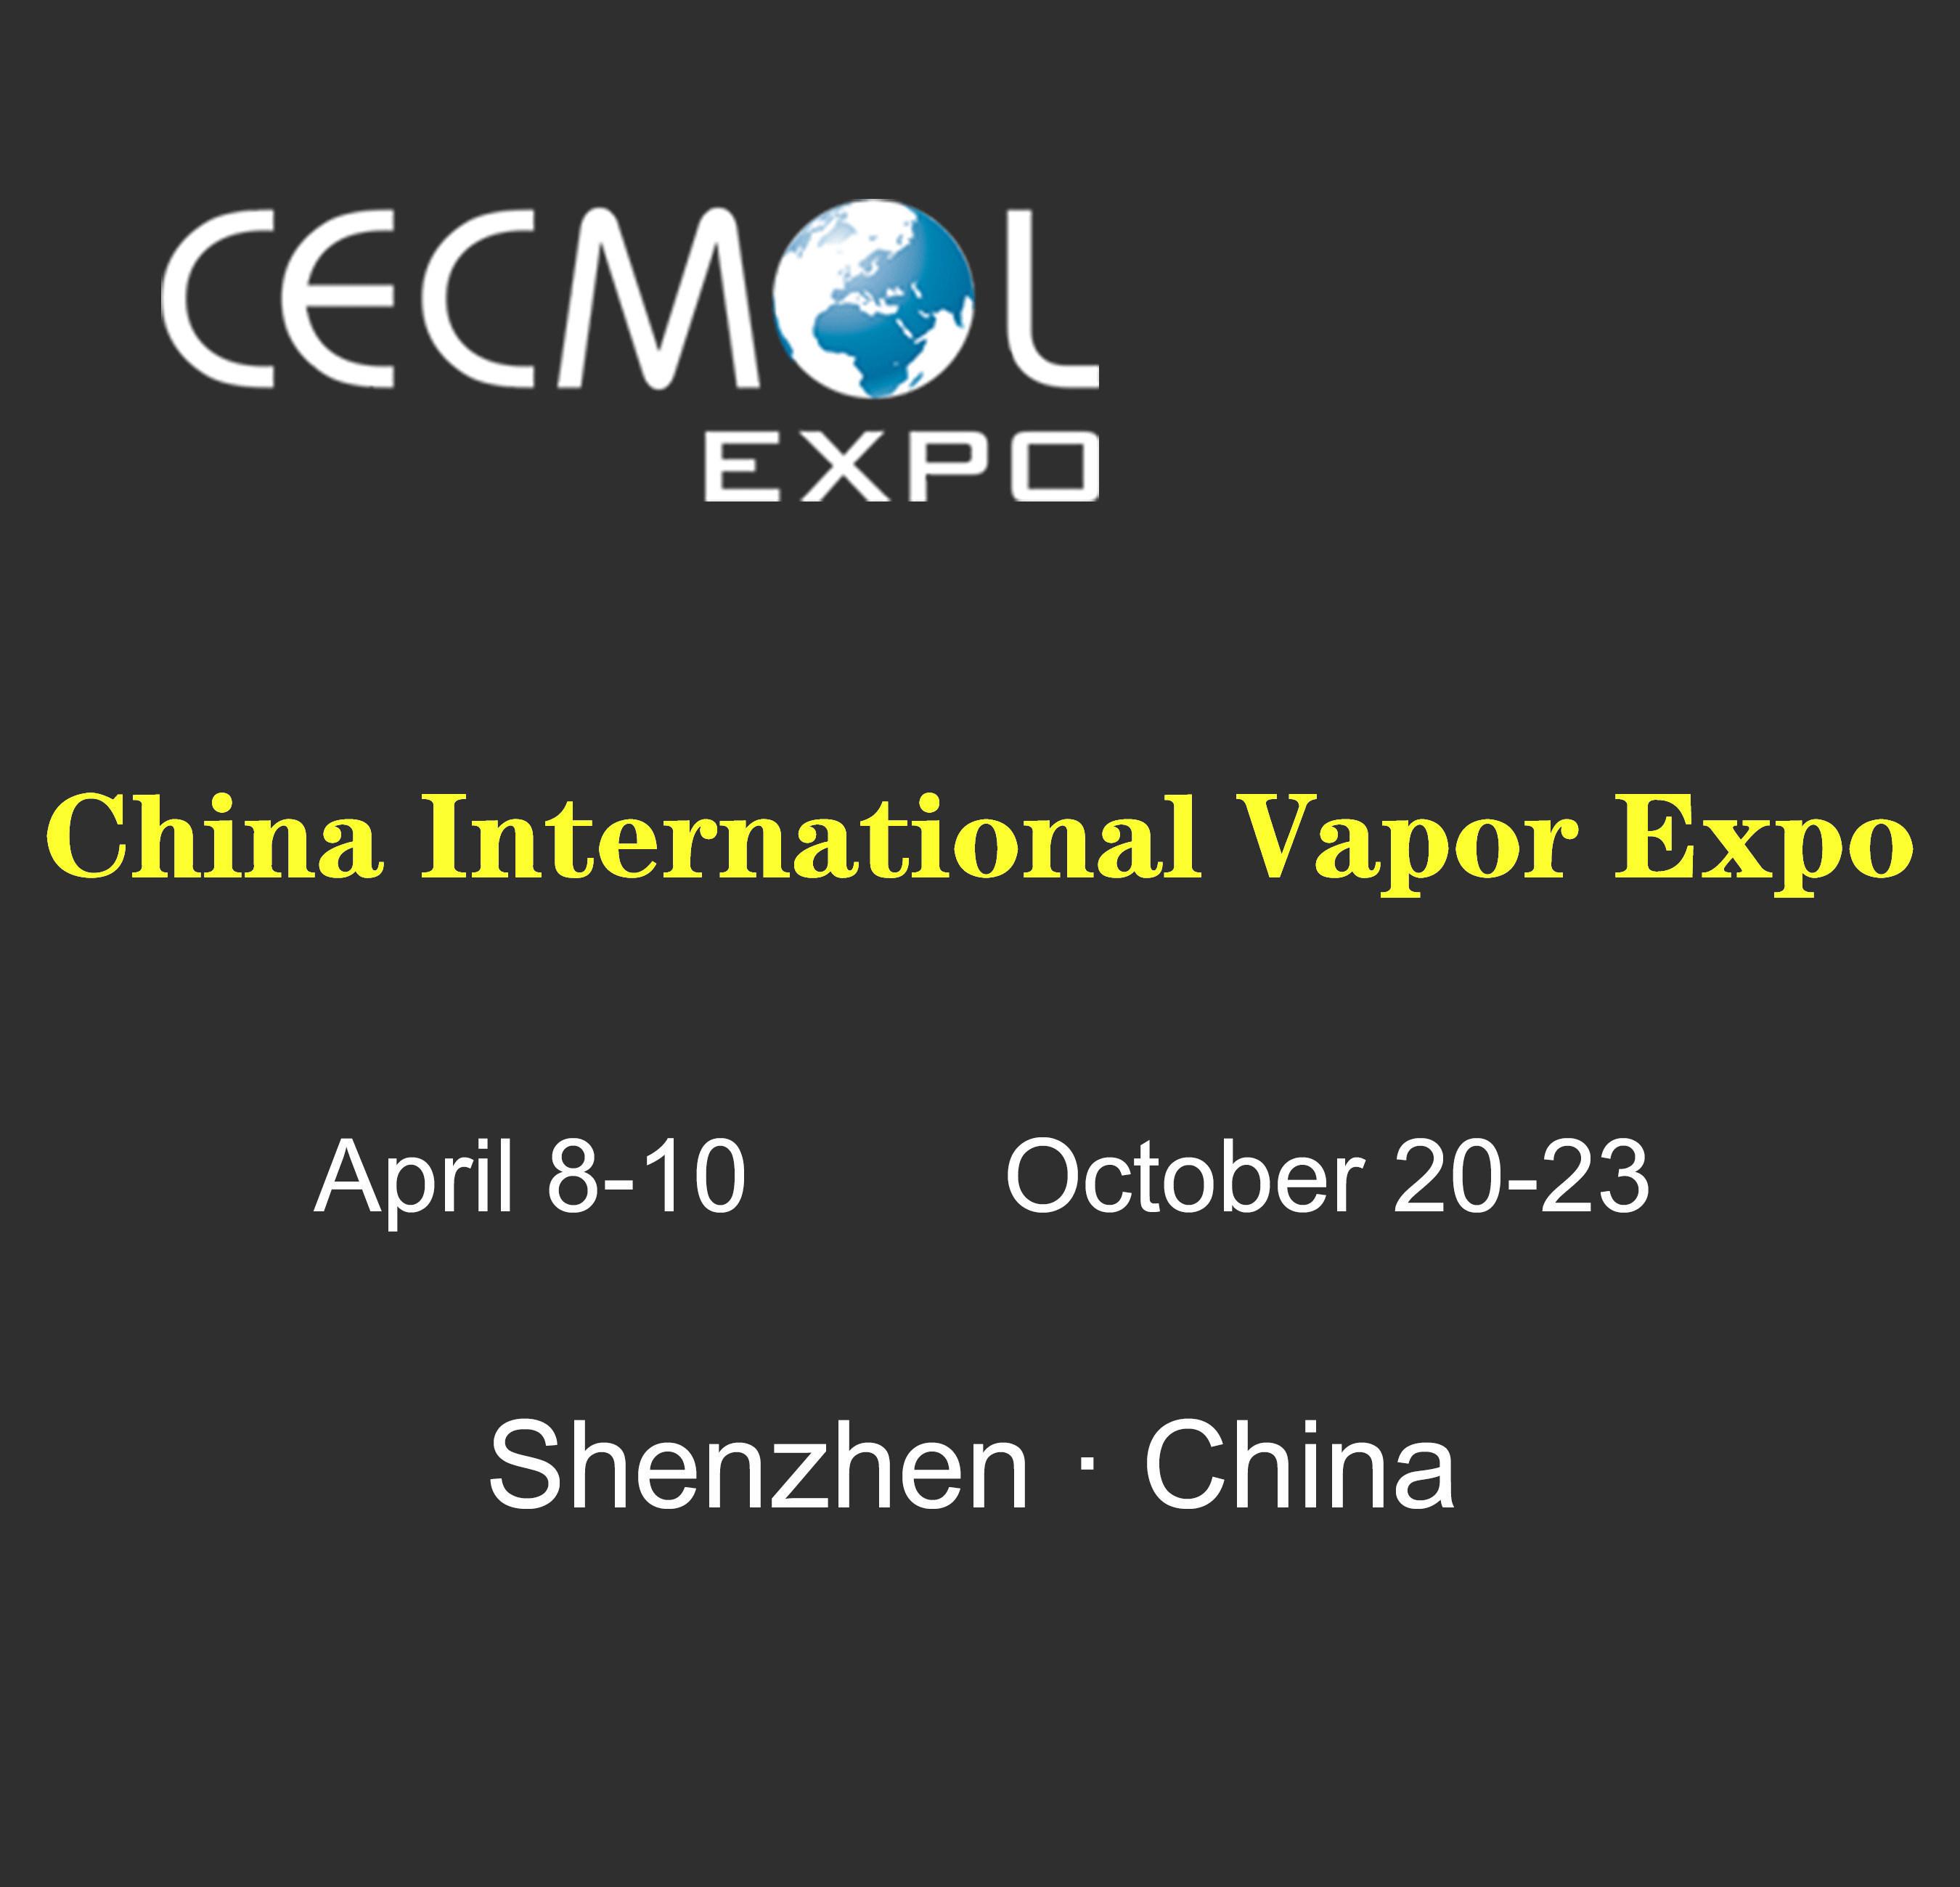 Le 2ème salon CECMOL China International Vapor Expo aura lieu à Shenzhen en octobre